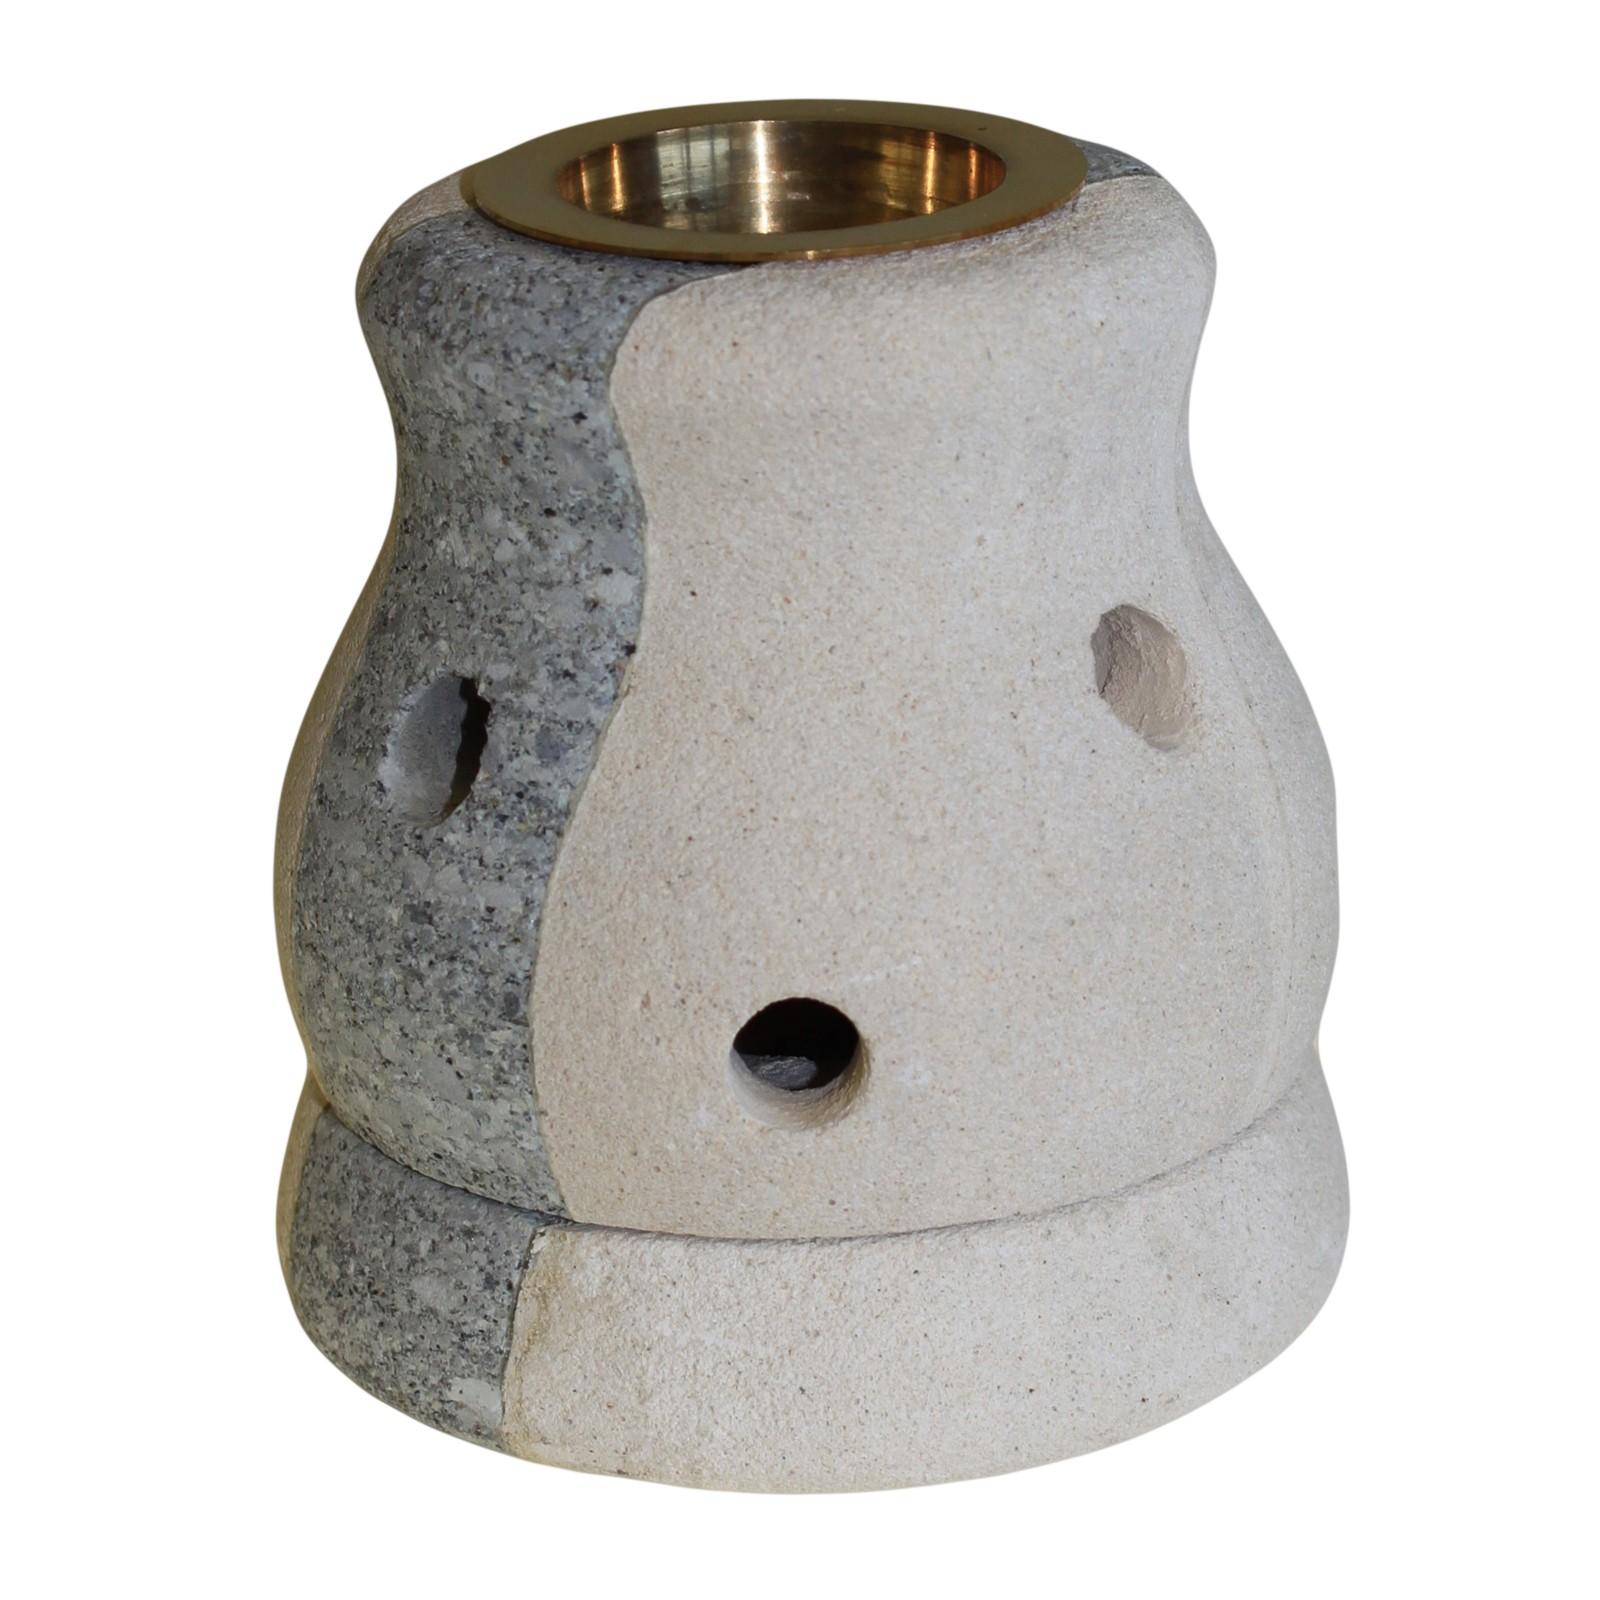 Stone Oil Burner Combo Shaped